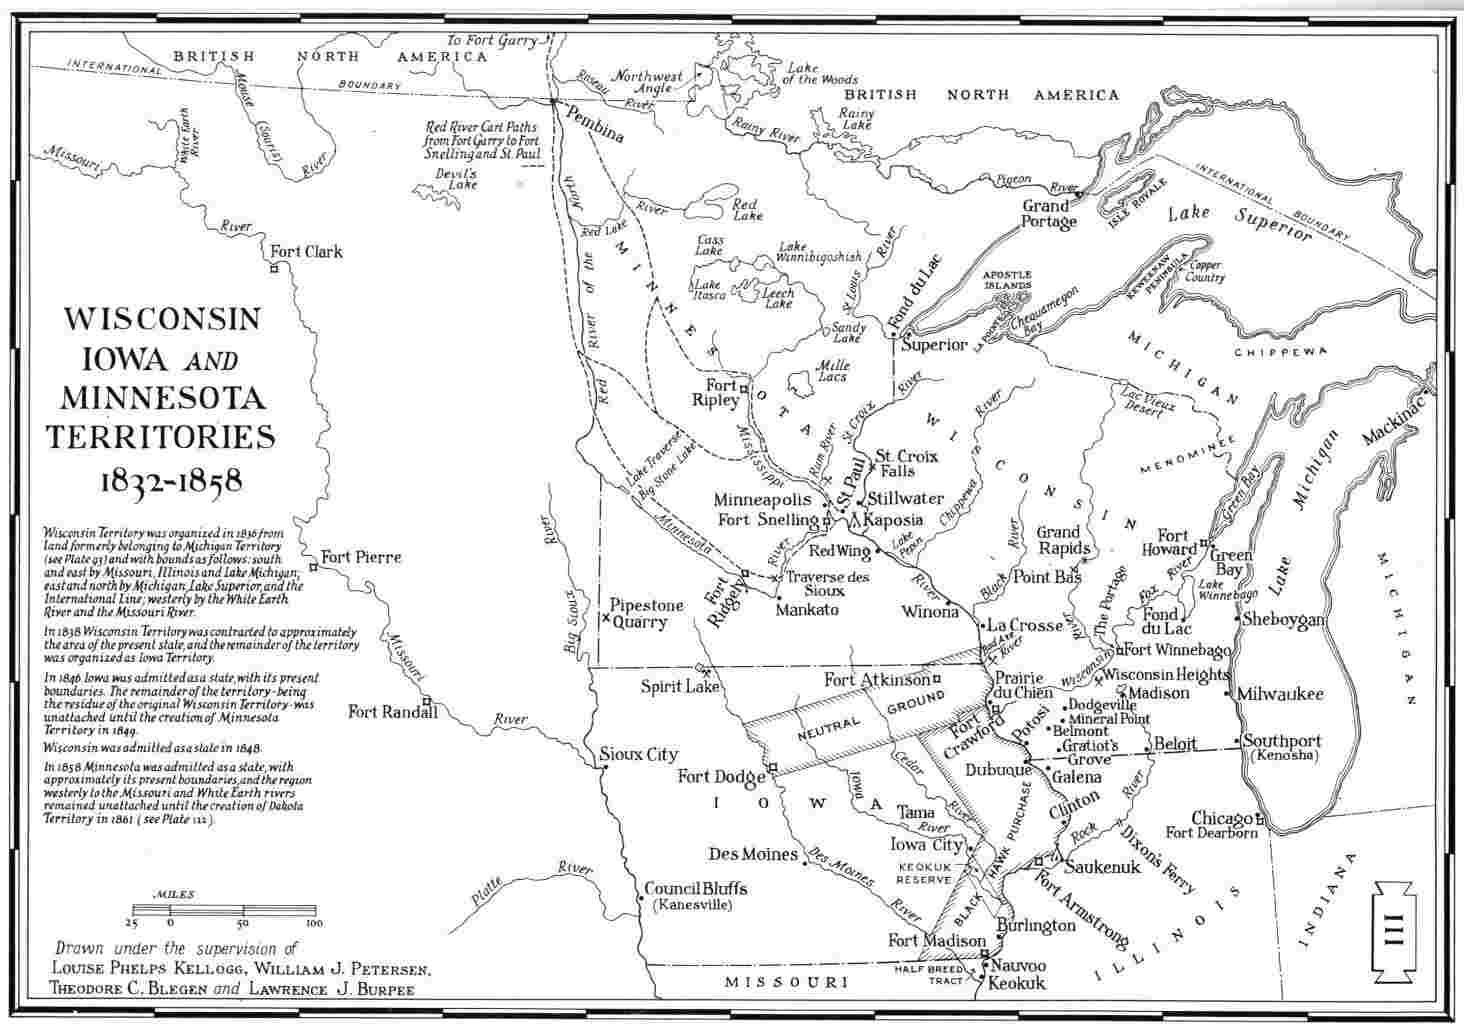 A History Of The Dahlheimer Family Of Minnesota